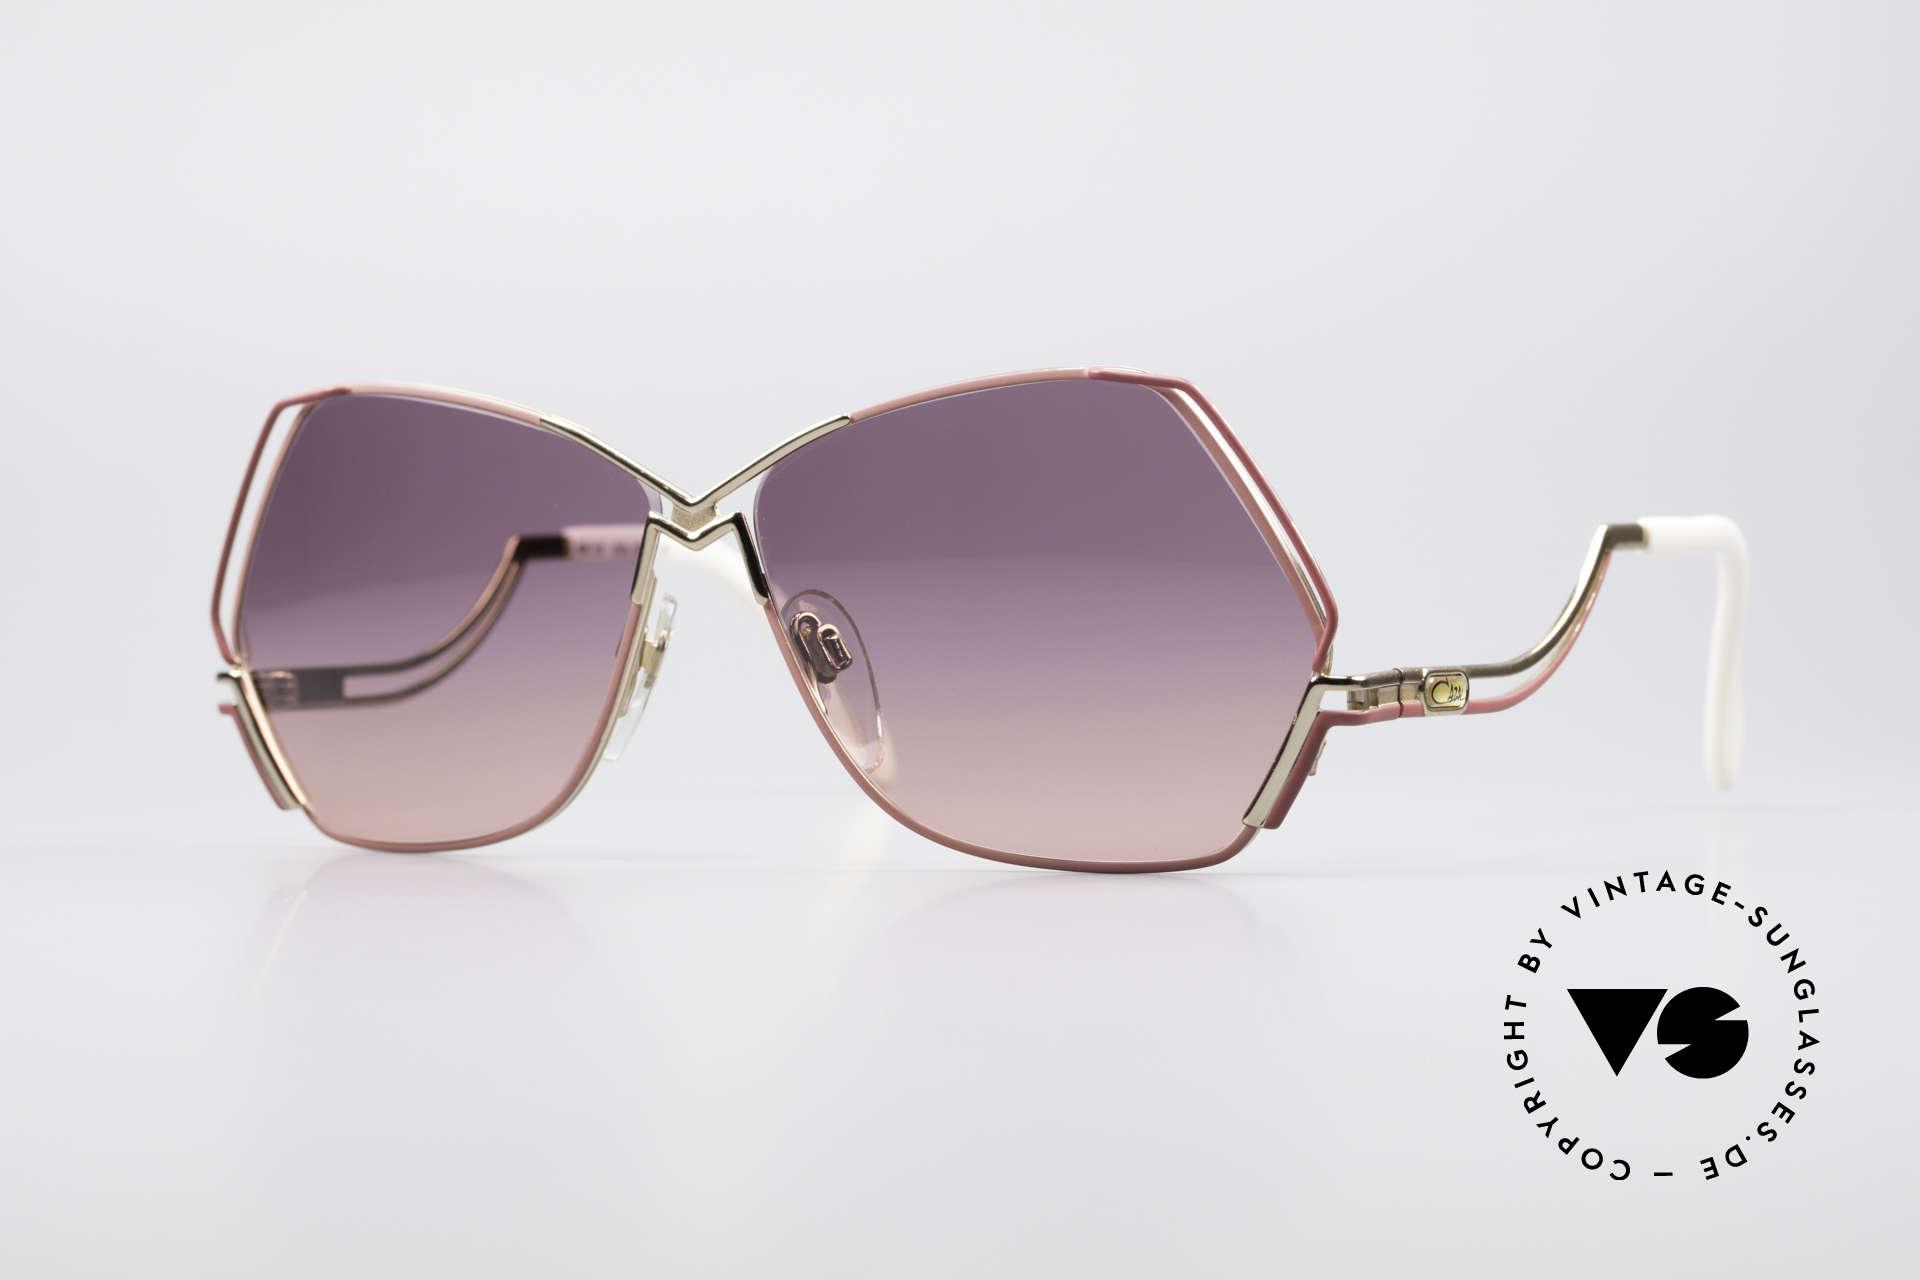 Cazal 226 Vintage Ladies Sunglasses, extraordinary CAZAL sunglasses with pentagonal lens, Made for Women